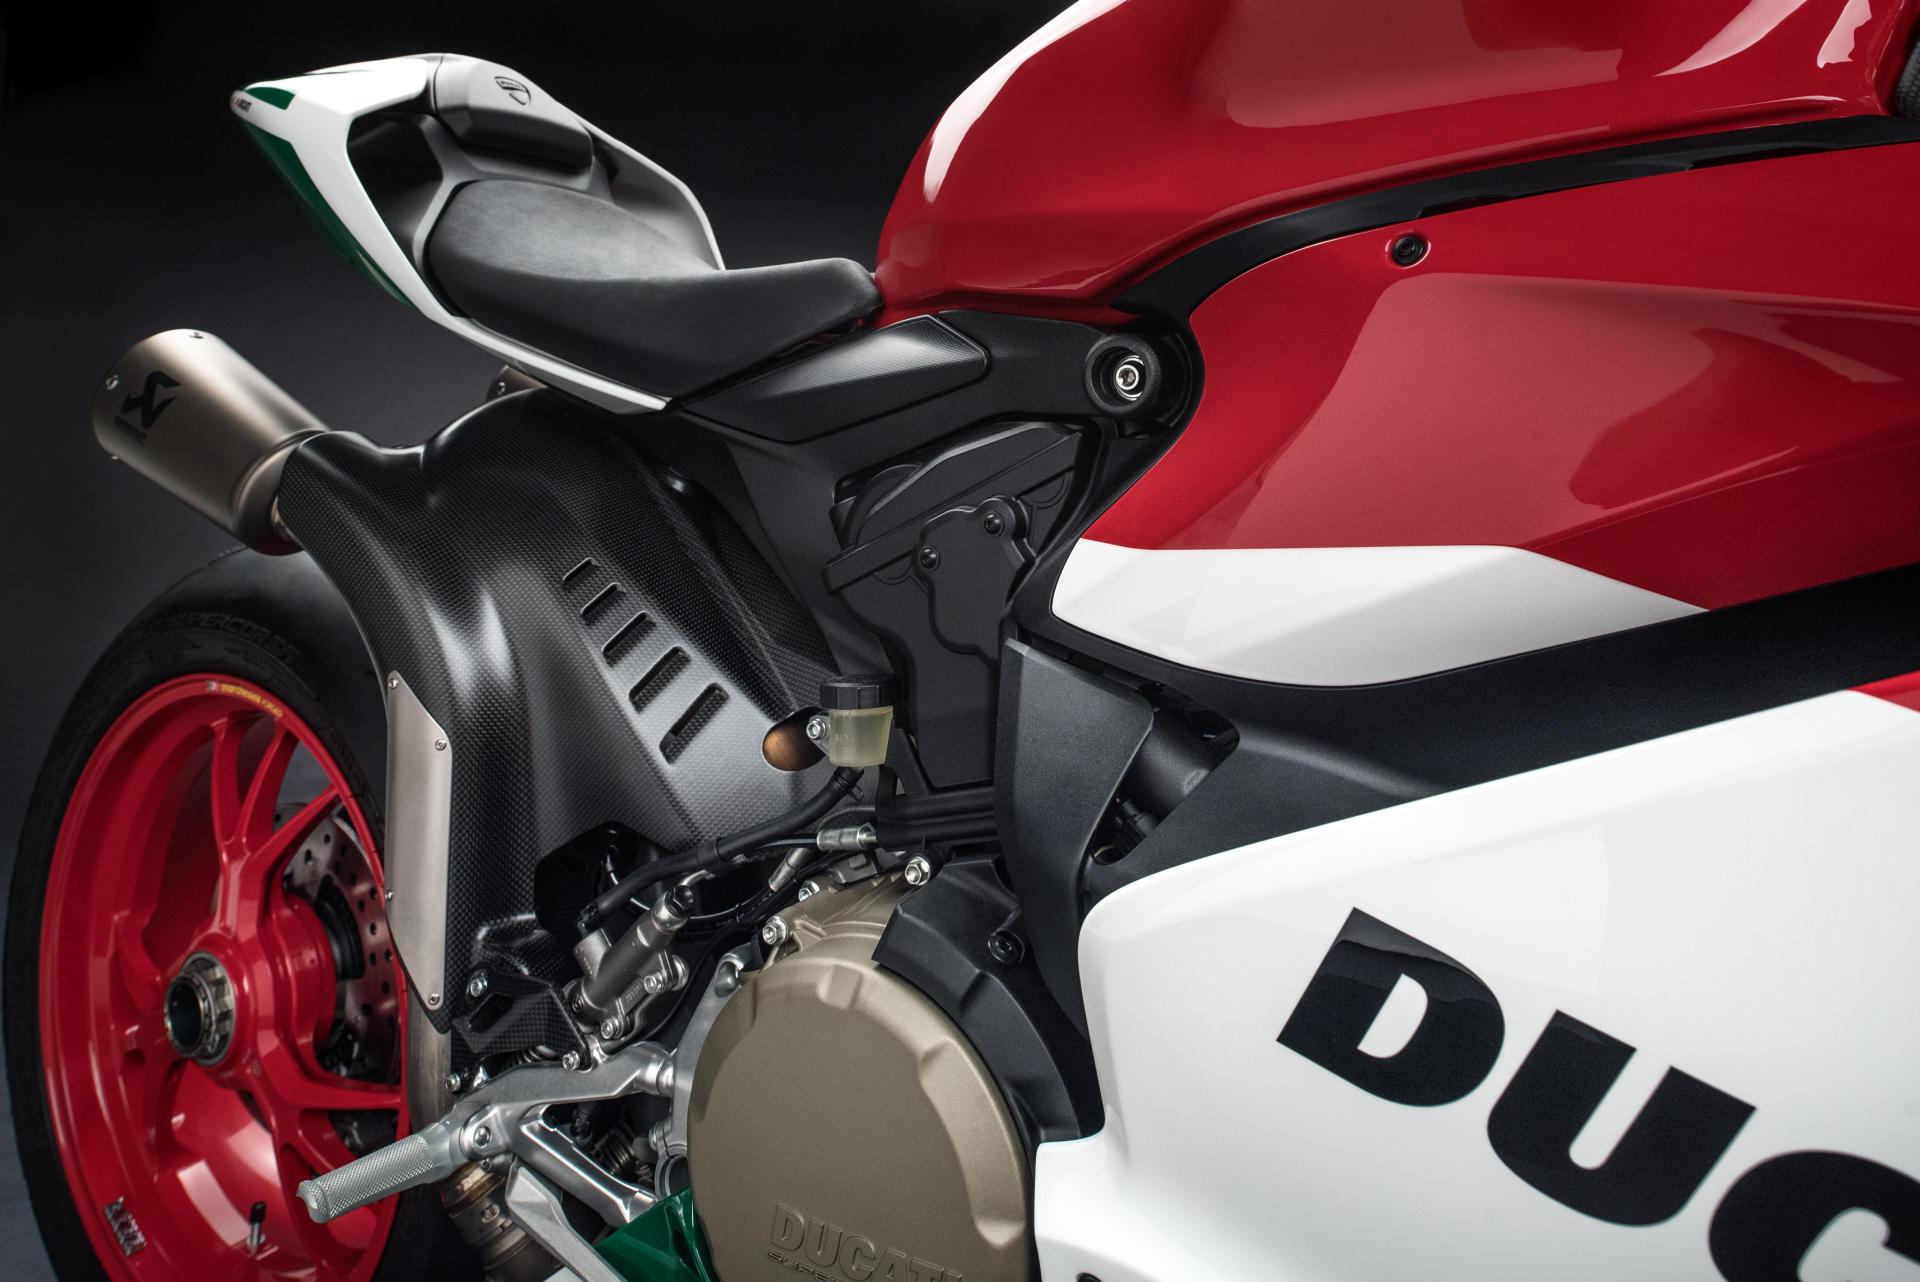 МОТОЦИКЛ DUCATI SUPERBIKE 1299 R FINAL EDITION  Артмото - купить квадроцикл в украине и харькове, мотоцикл, снегоход, скутер, мопед, электромобиль